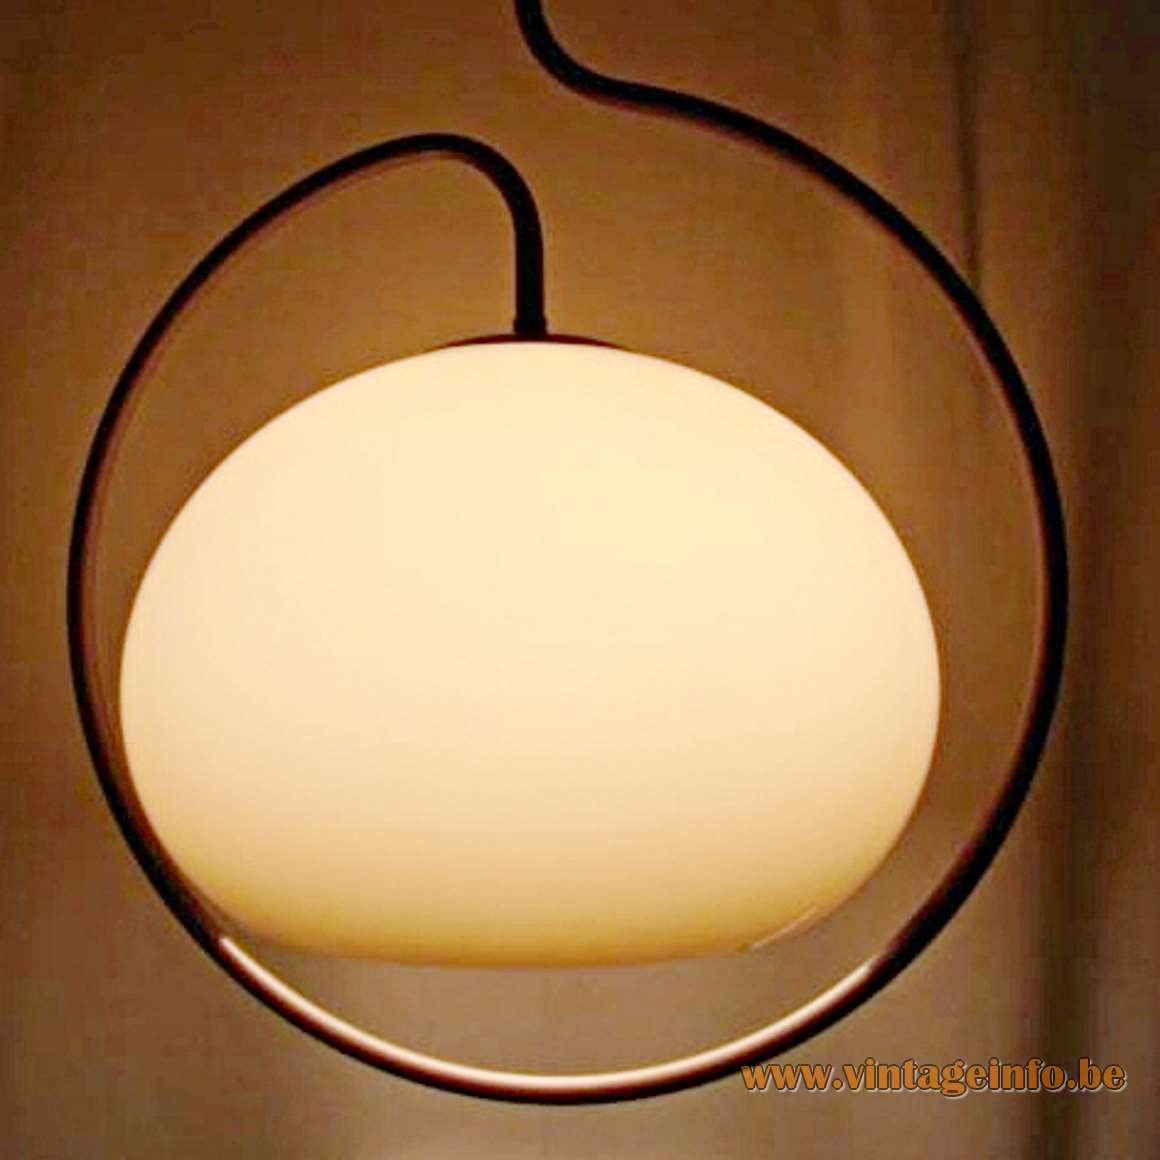 Dijkstra Circle Pendant Lamp, 1970s, brown acrylic globe, chrome rod